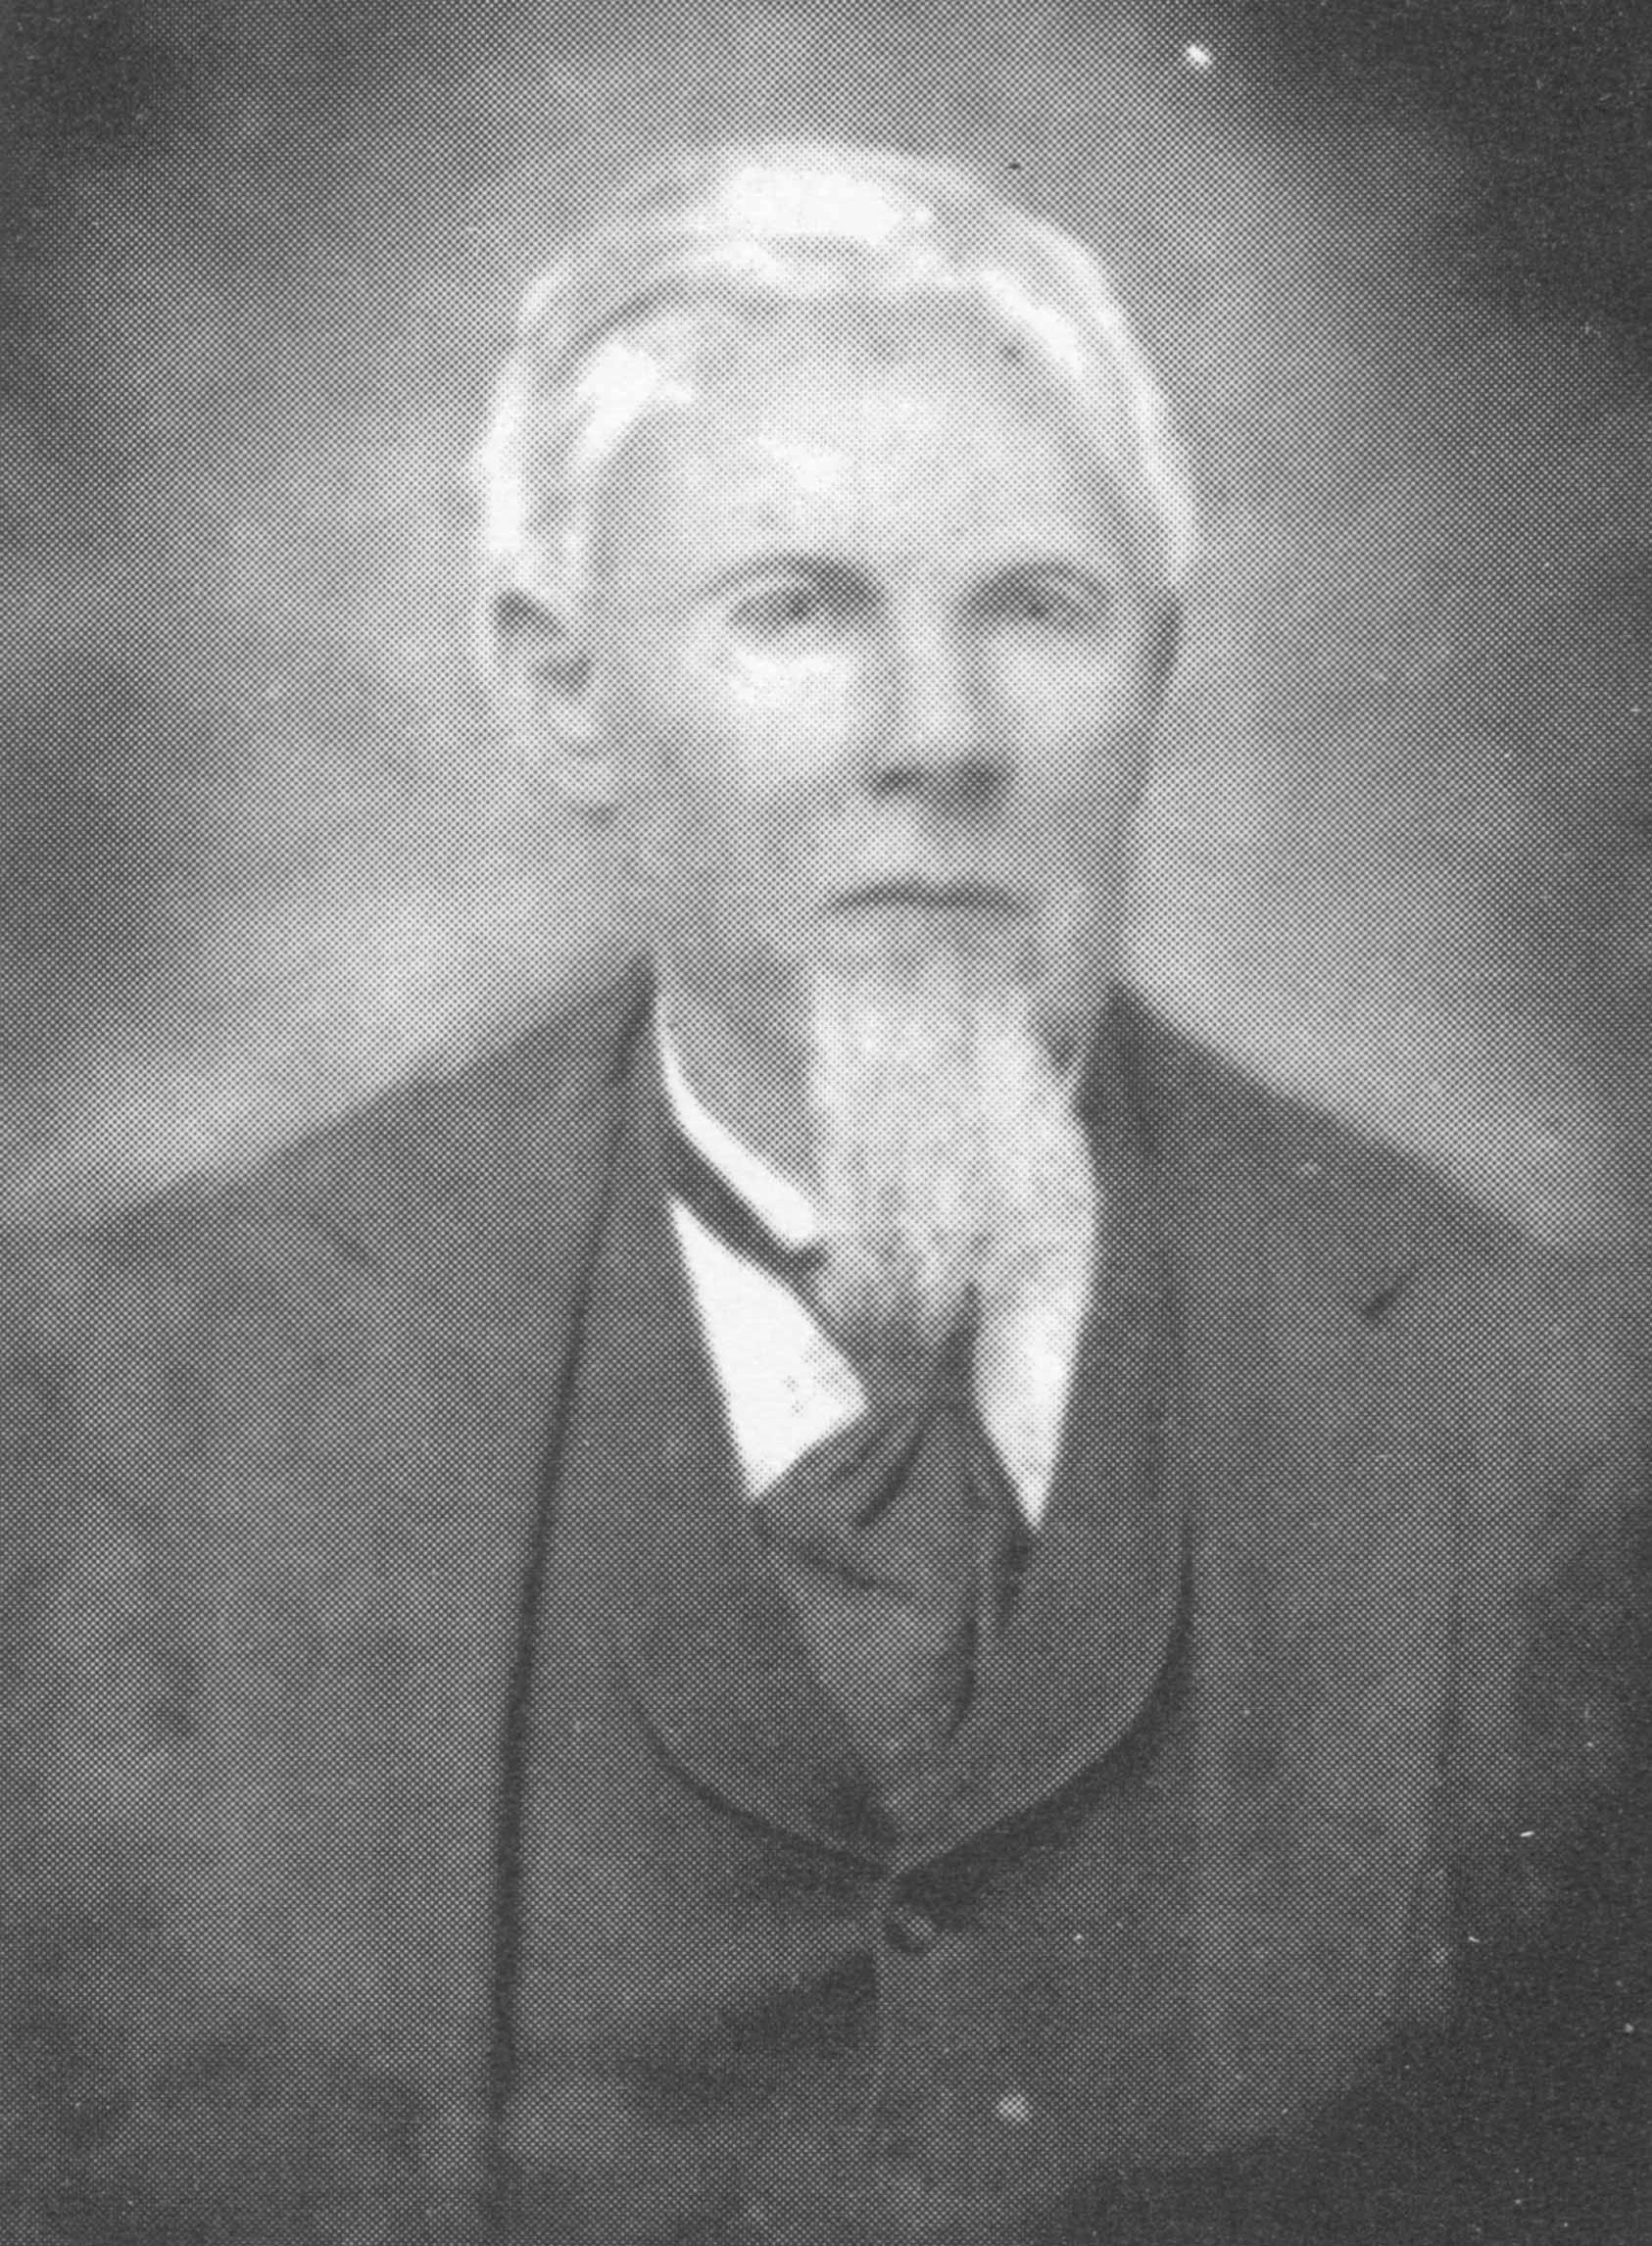 Isaac Walton Garrett